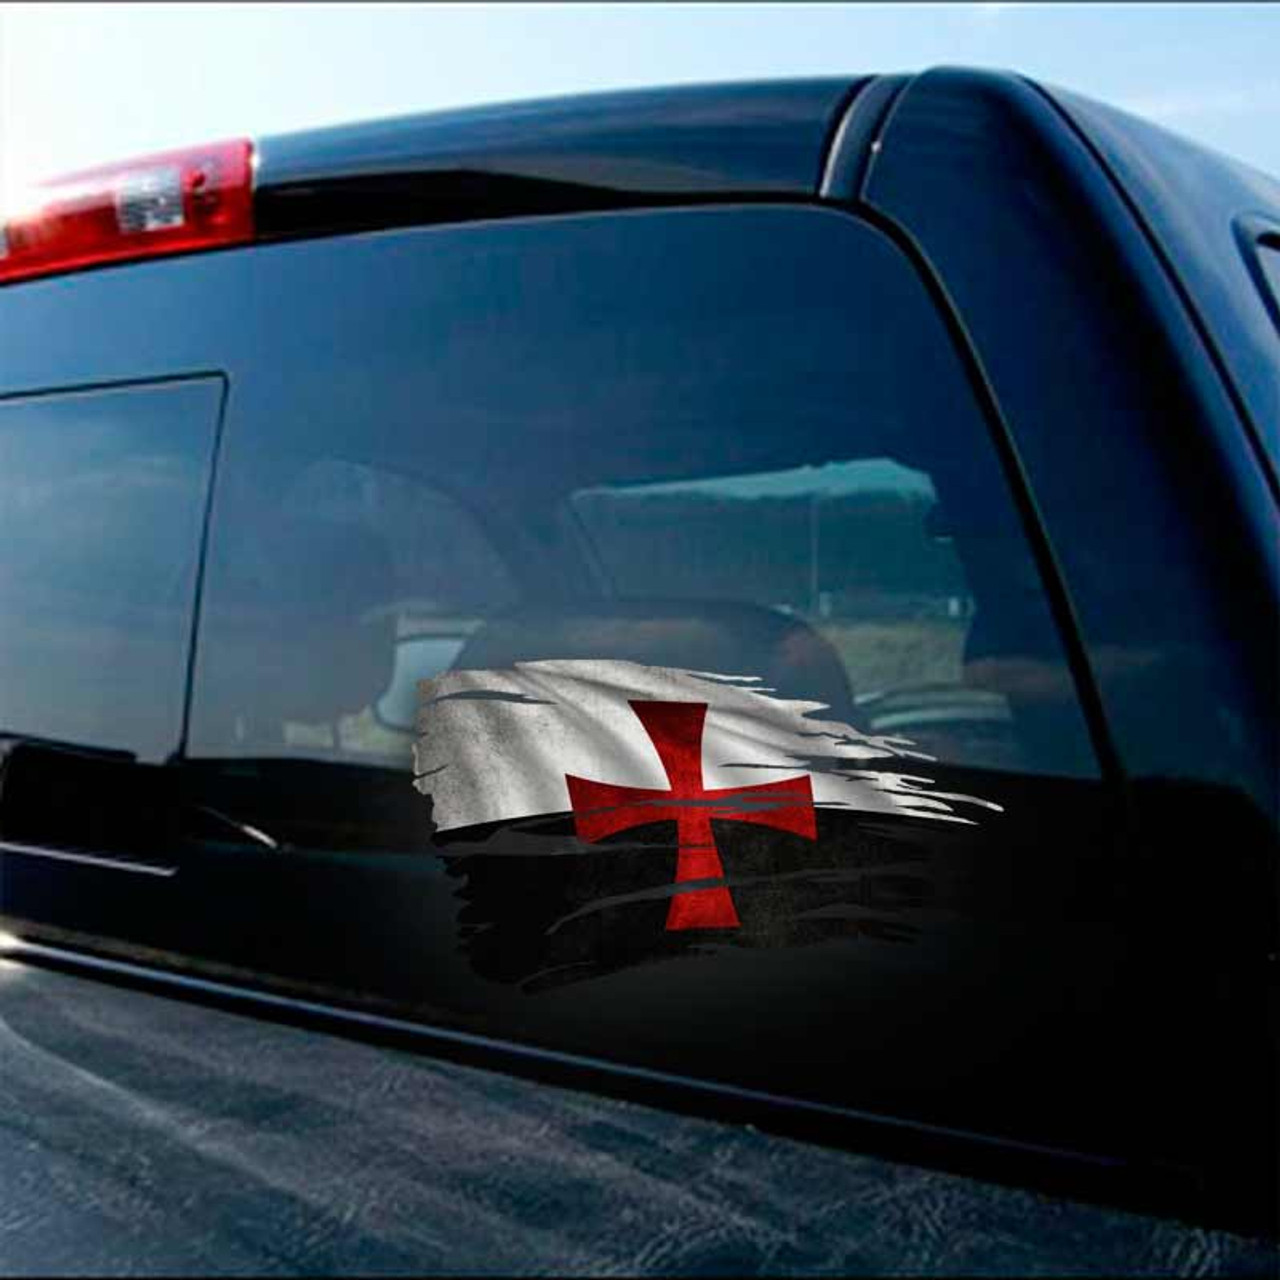 Texas Longhorns 4x4 Perfect Cut Decal Sticker Car Truck Auto FAST SHIP